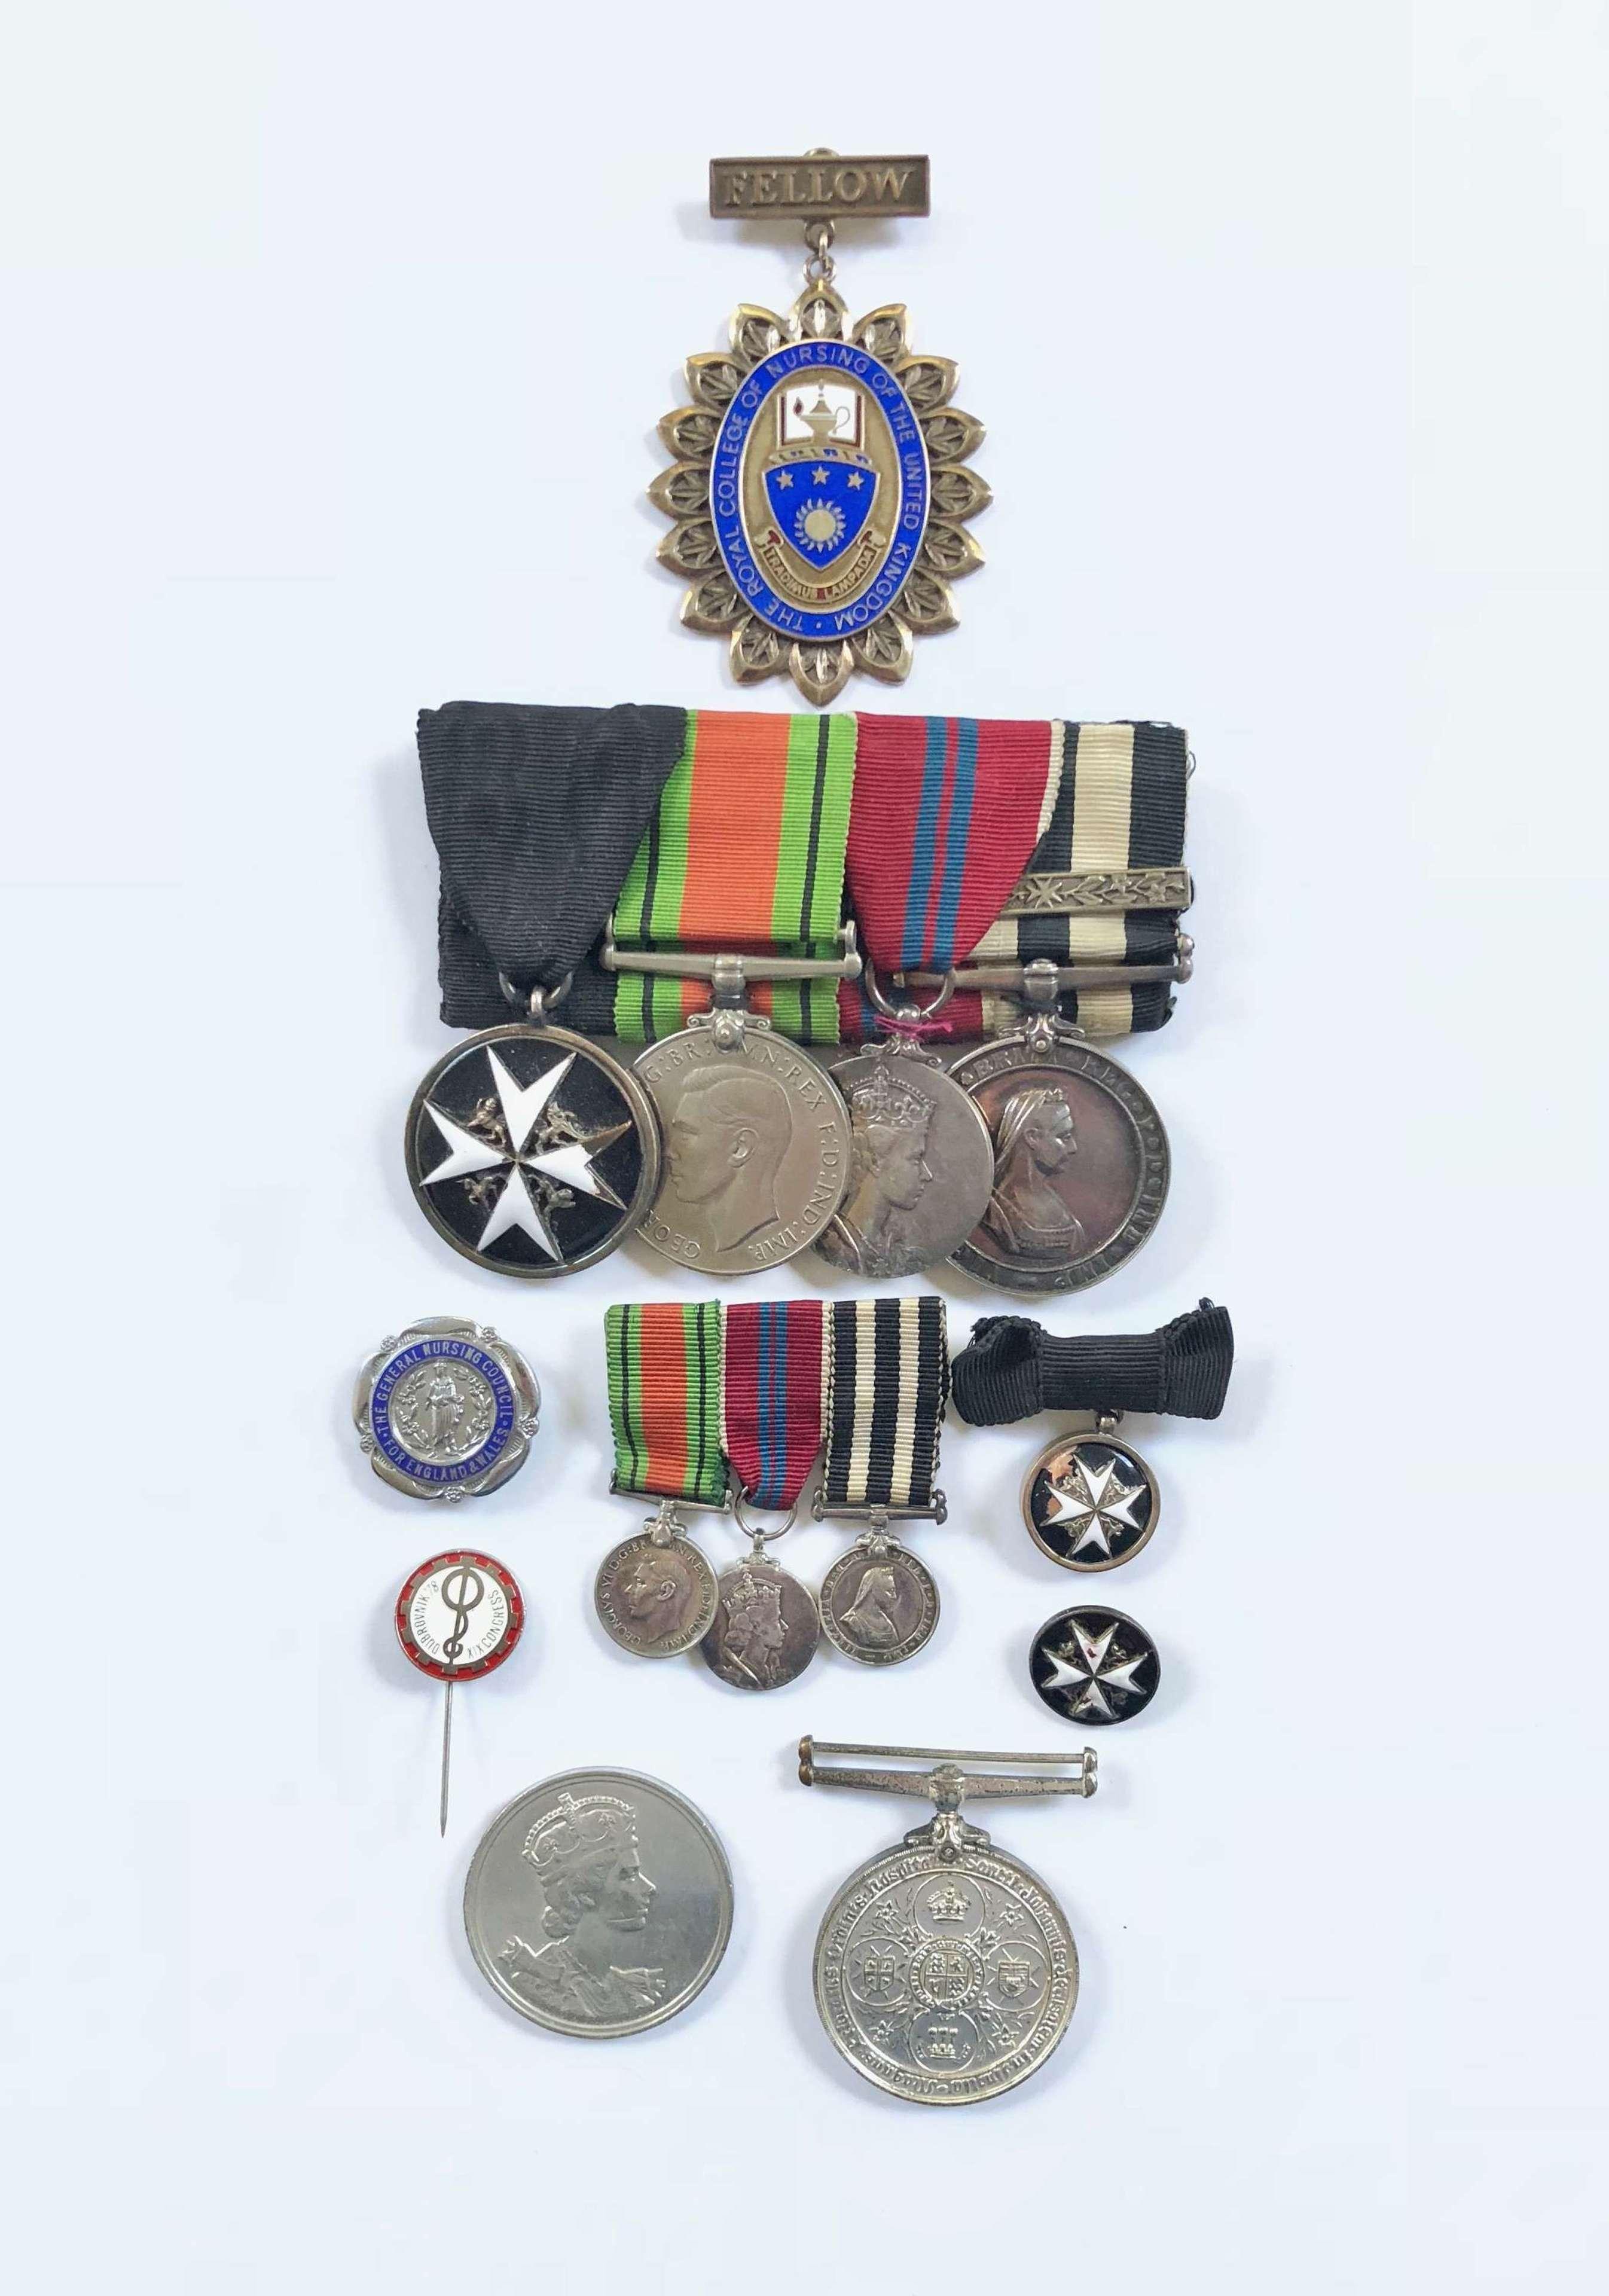 WW2 London St John Ambulance Nurse Medal Group.